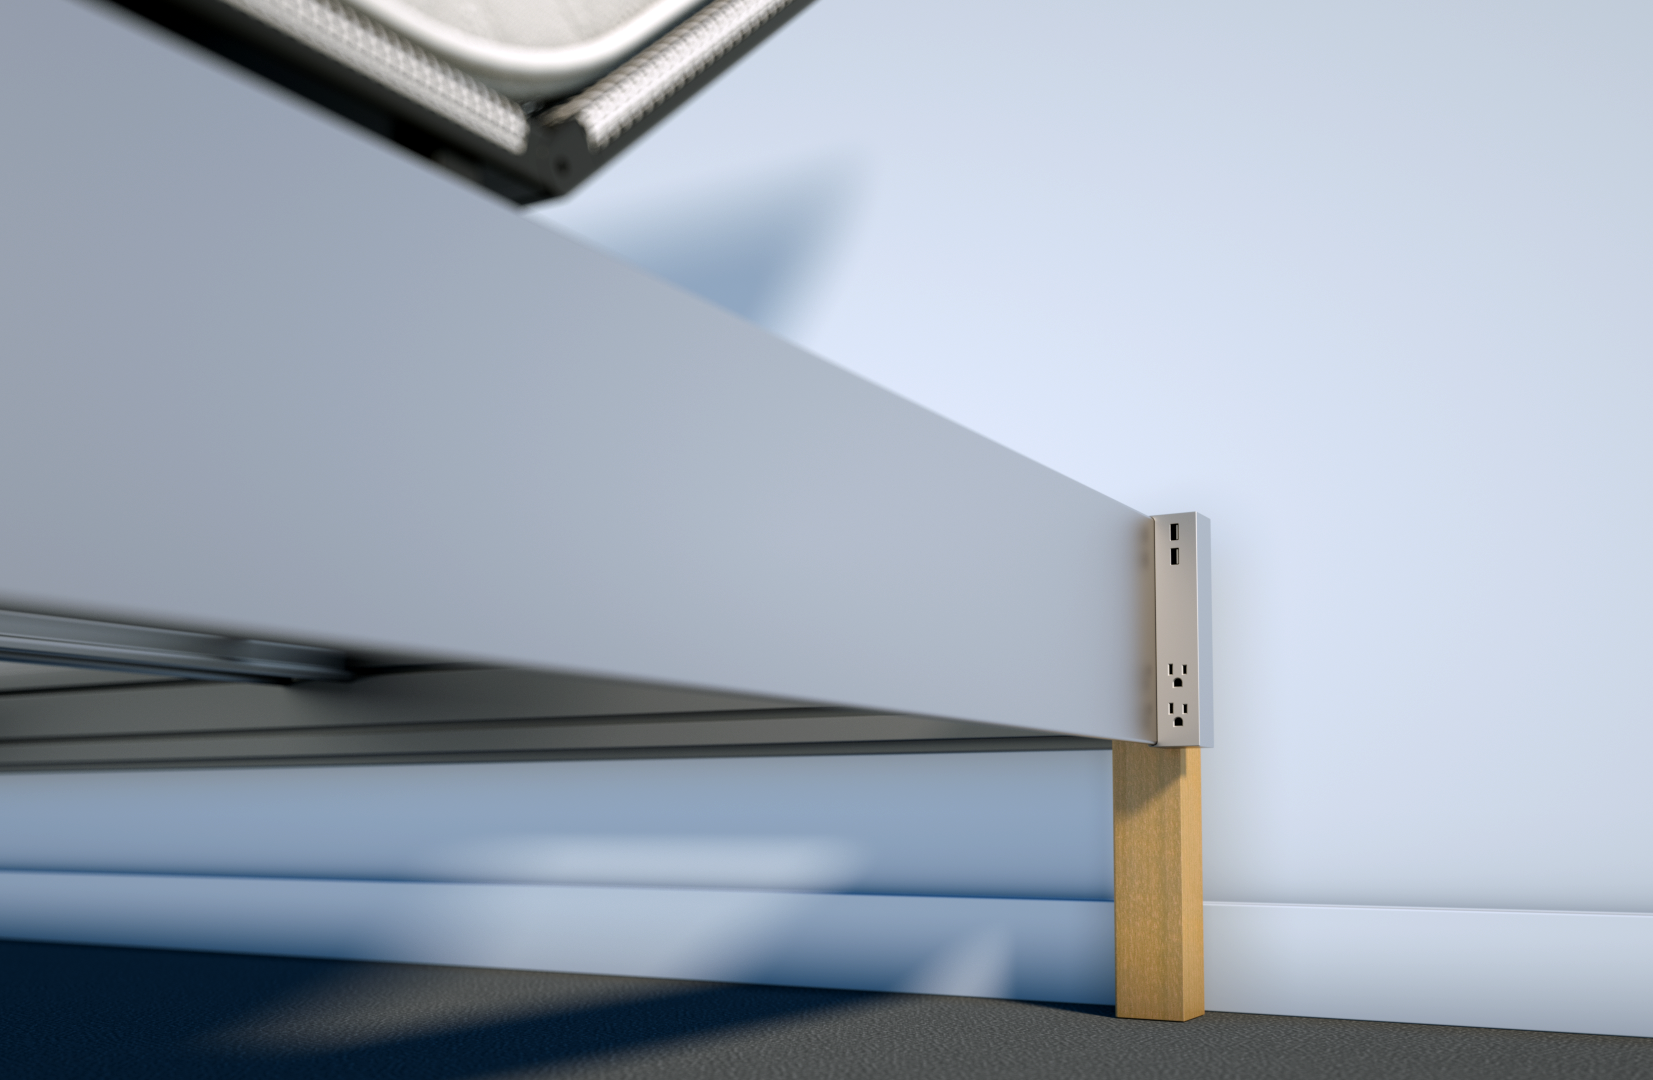 adjustable plug close up.png